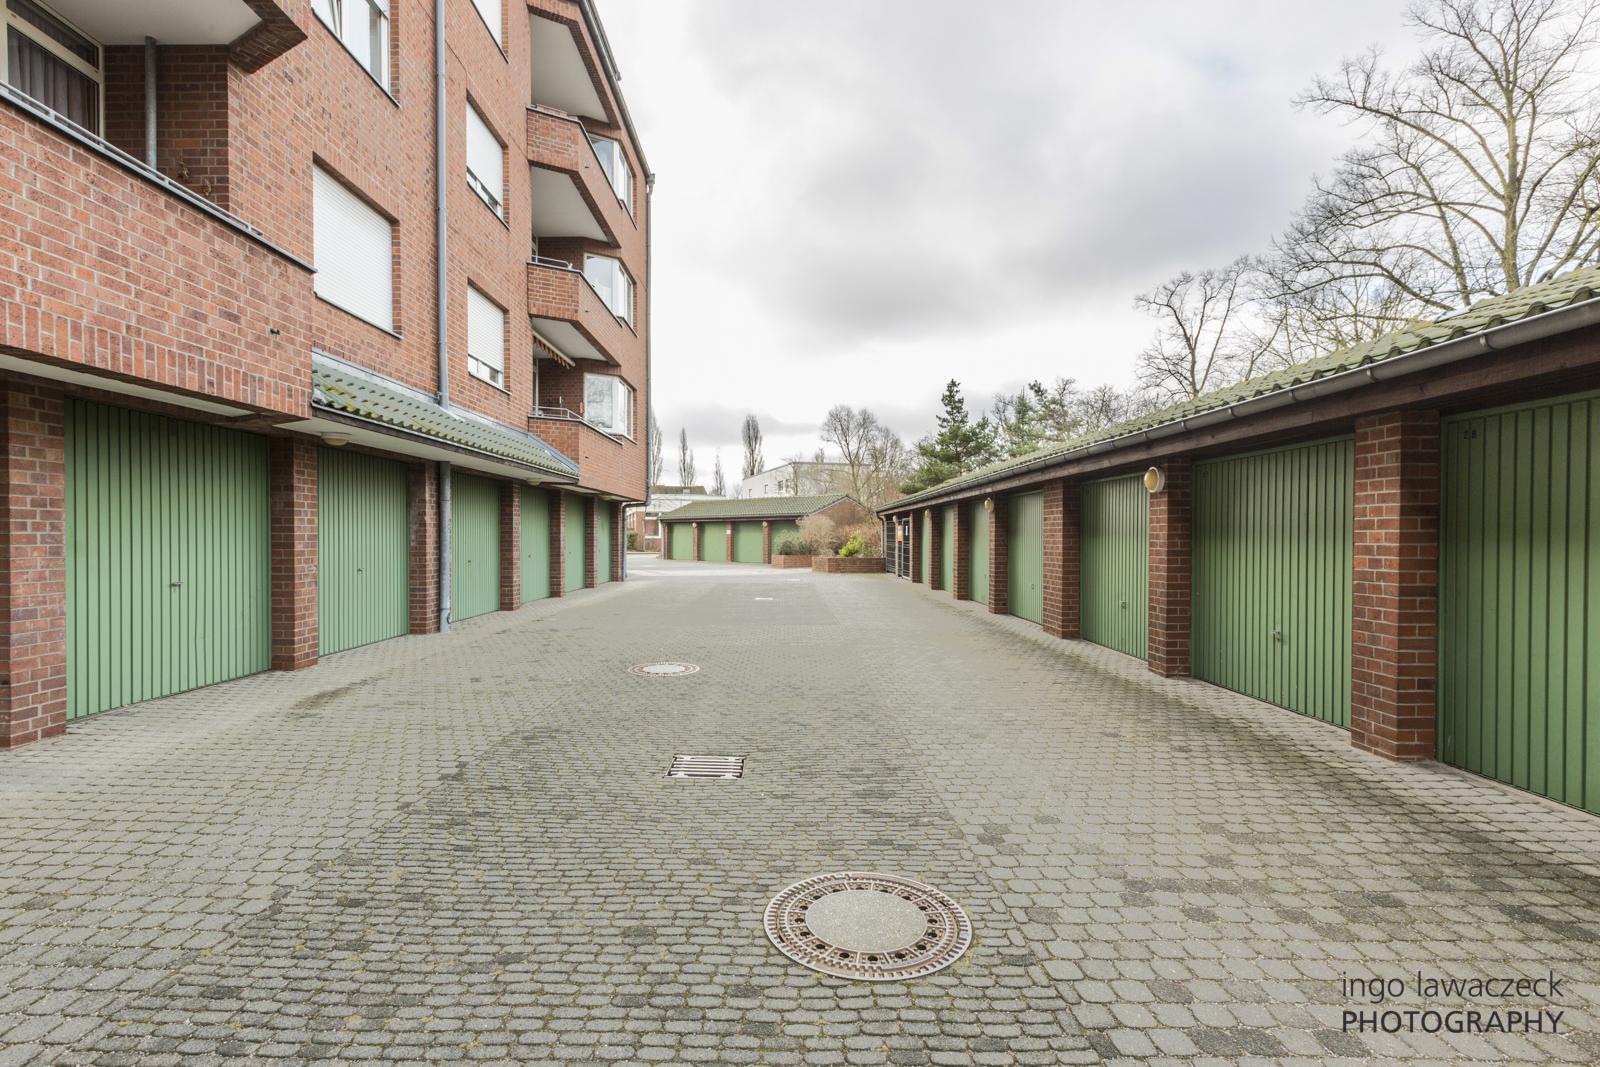 Hermsdorfer_Straße_26-23